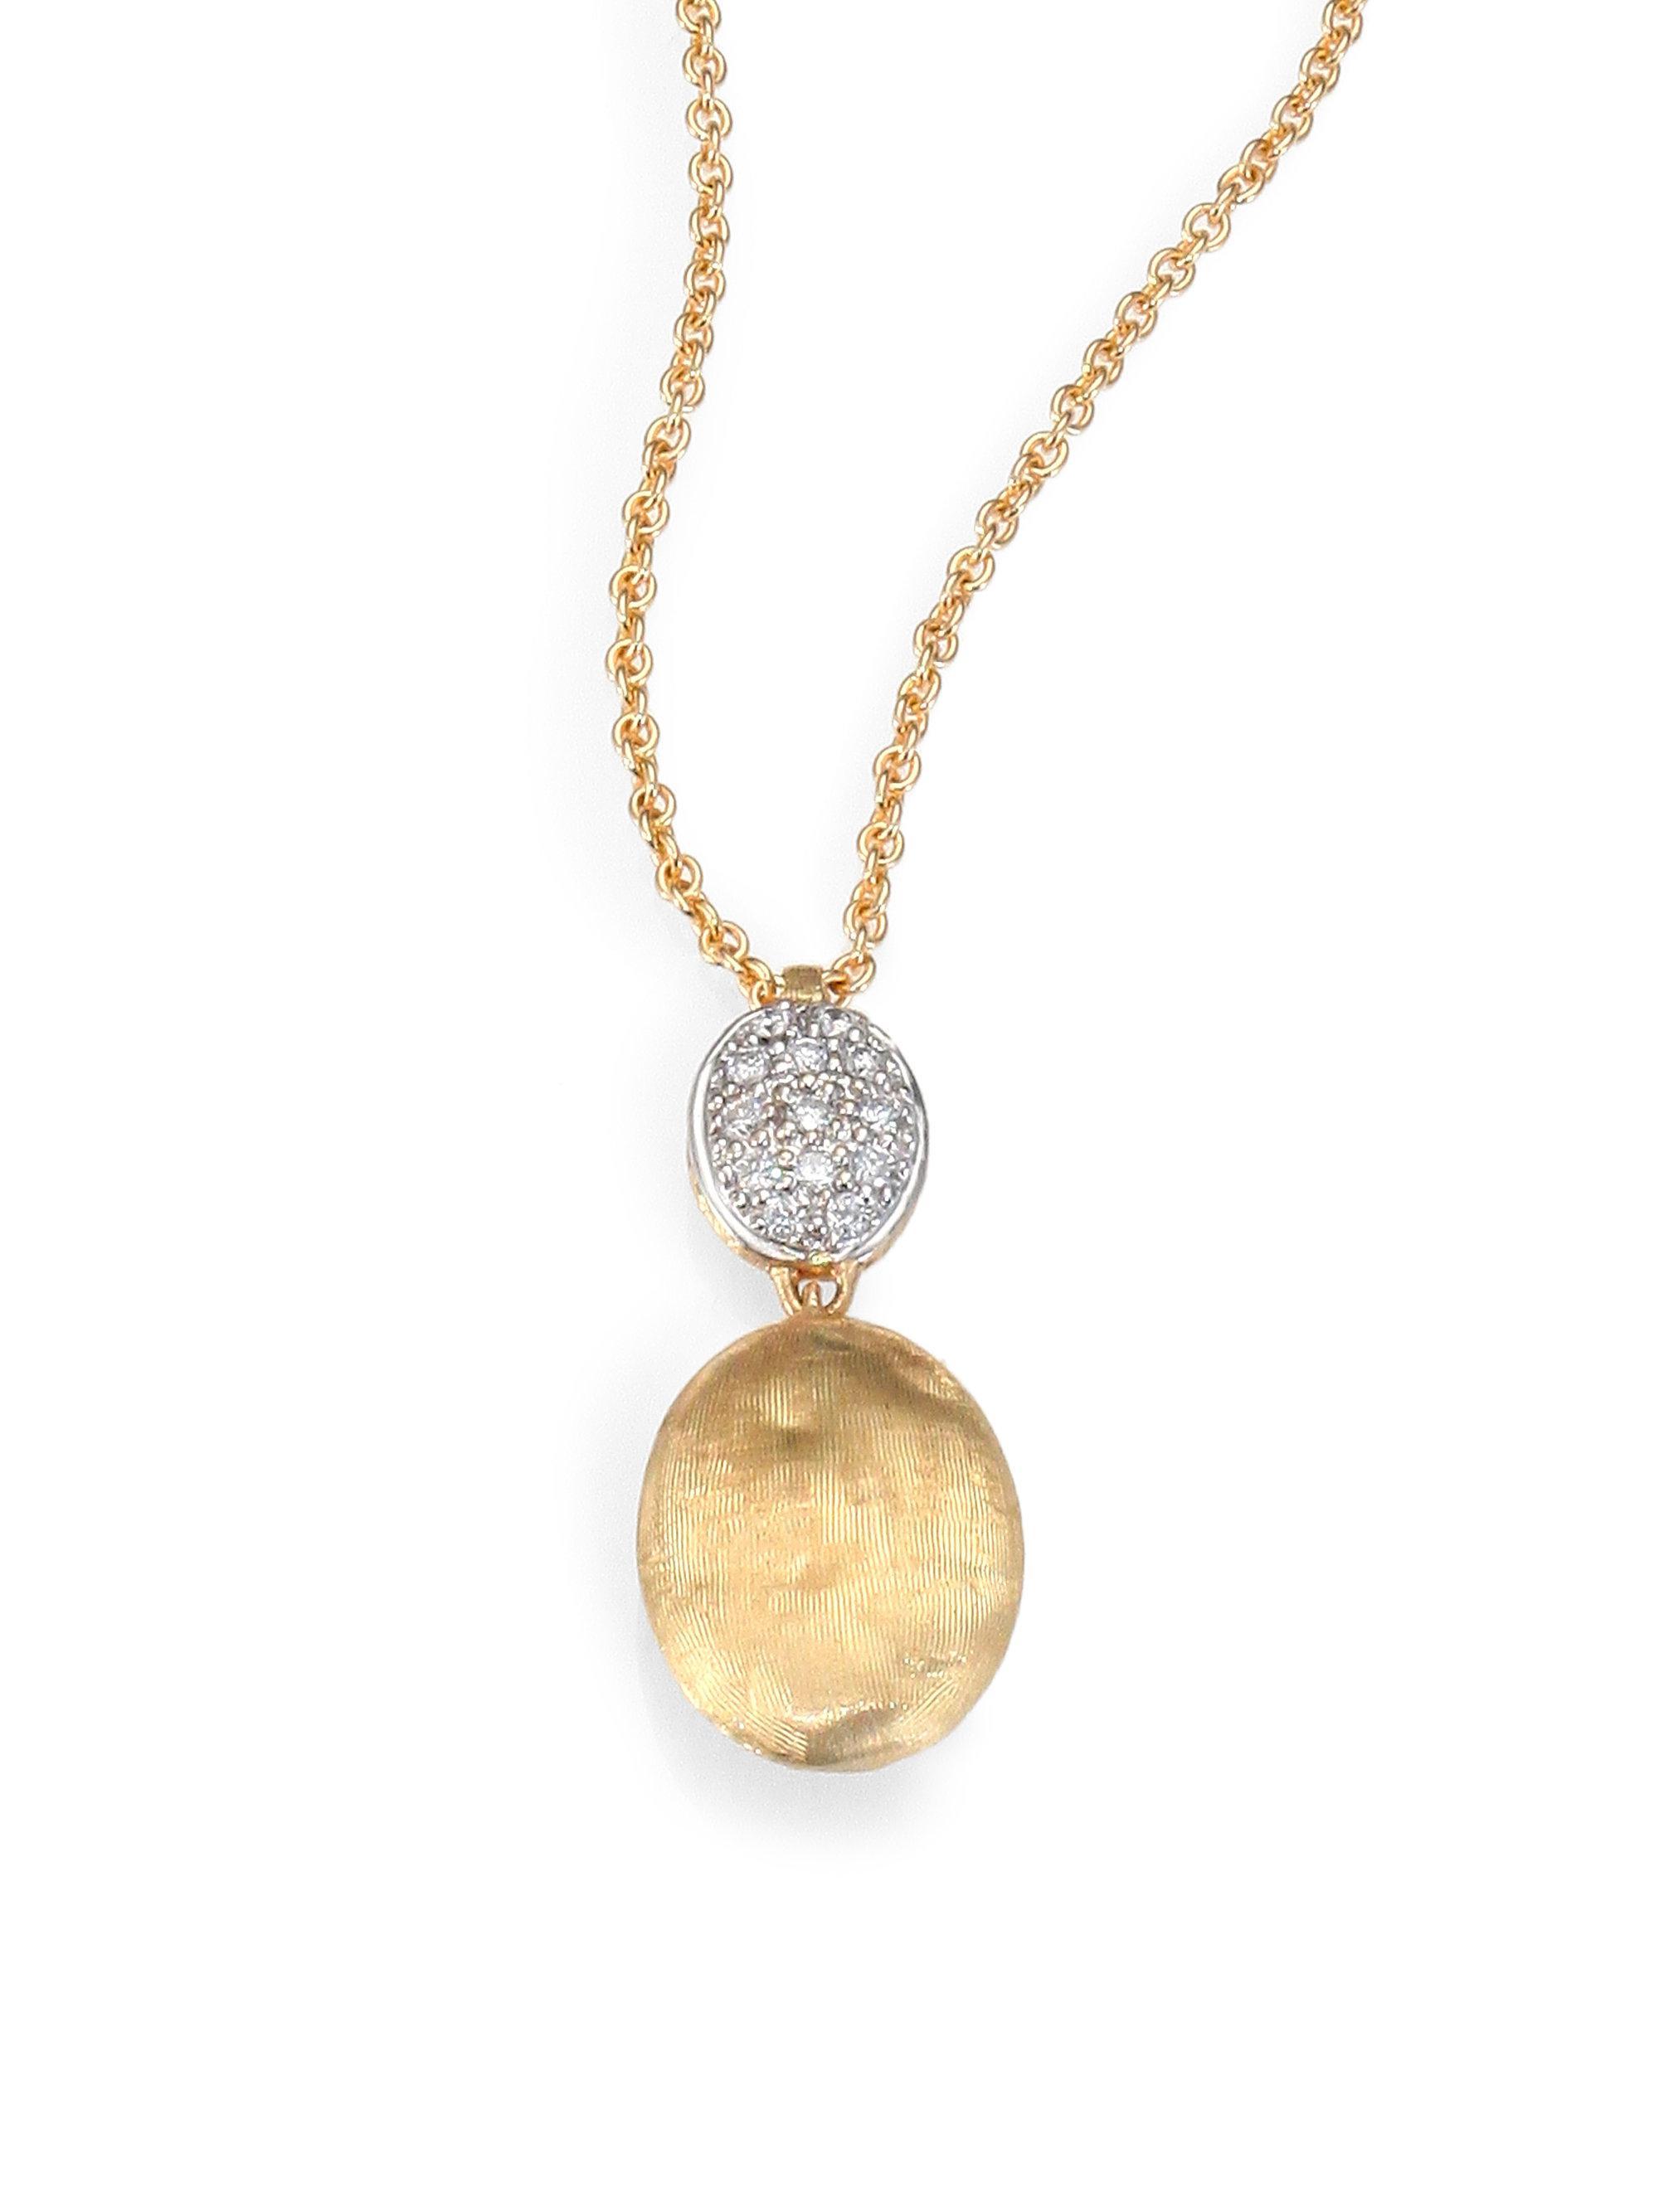 Marco Bicego Siviglia 18K Gold & Pavé Diamond Pendant Necklace Um8pj